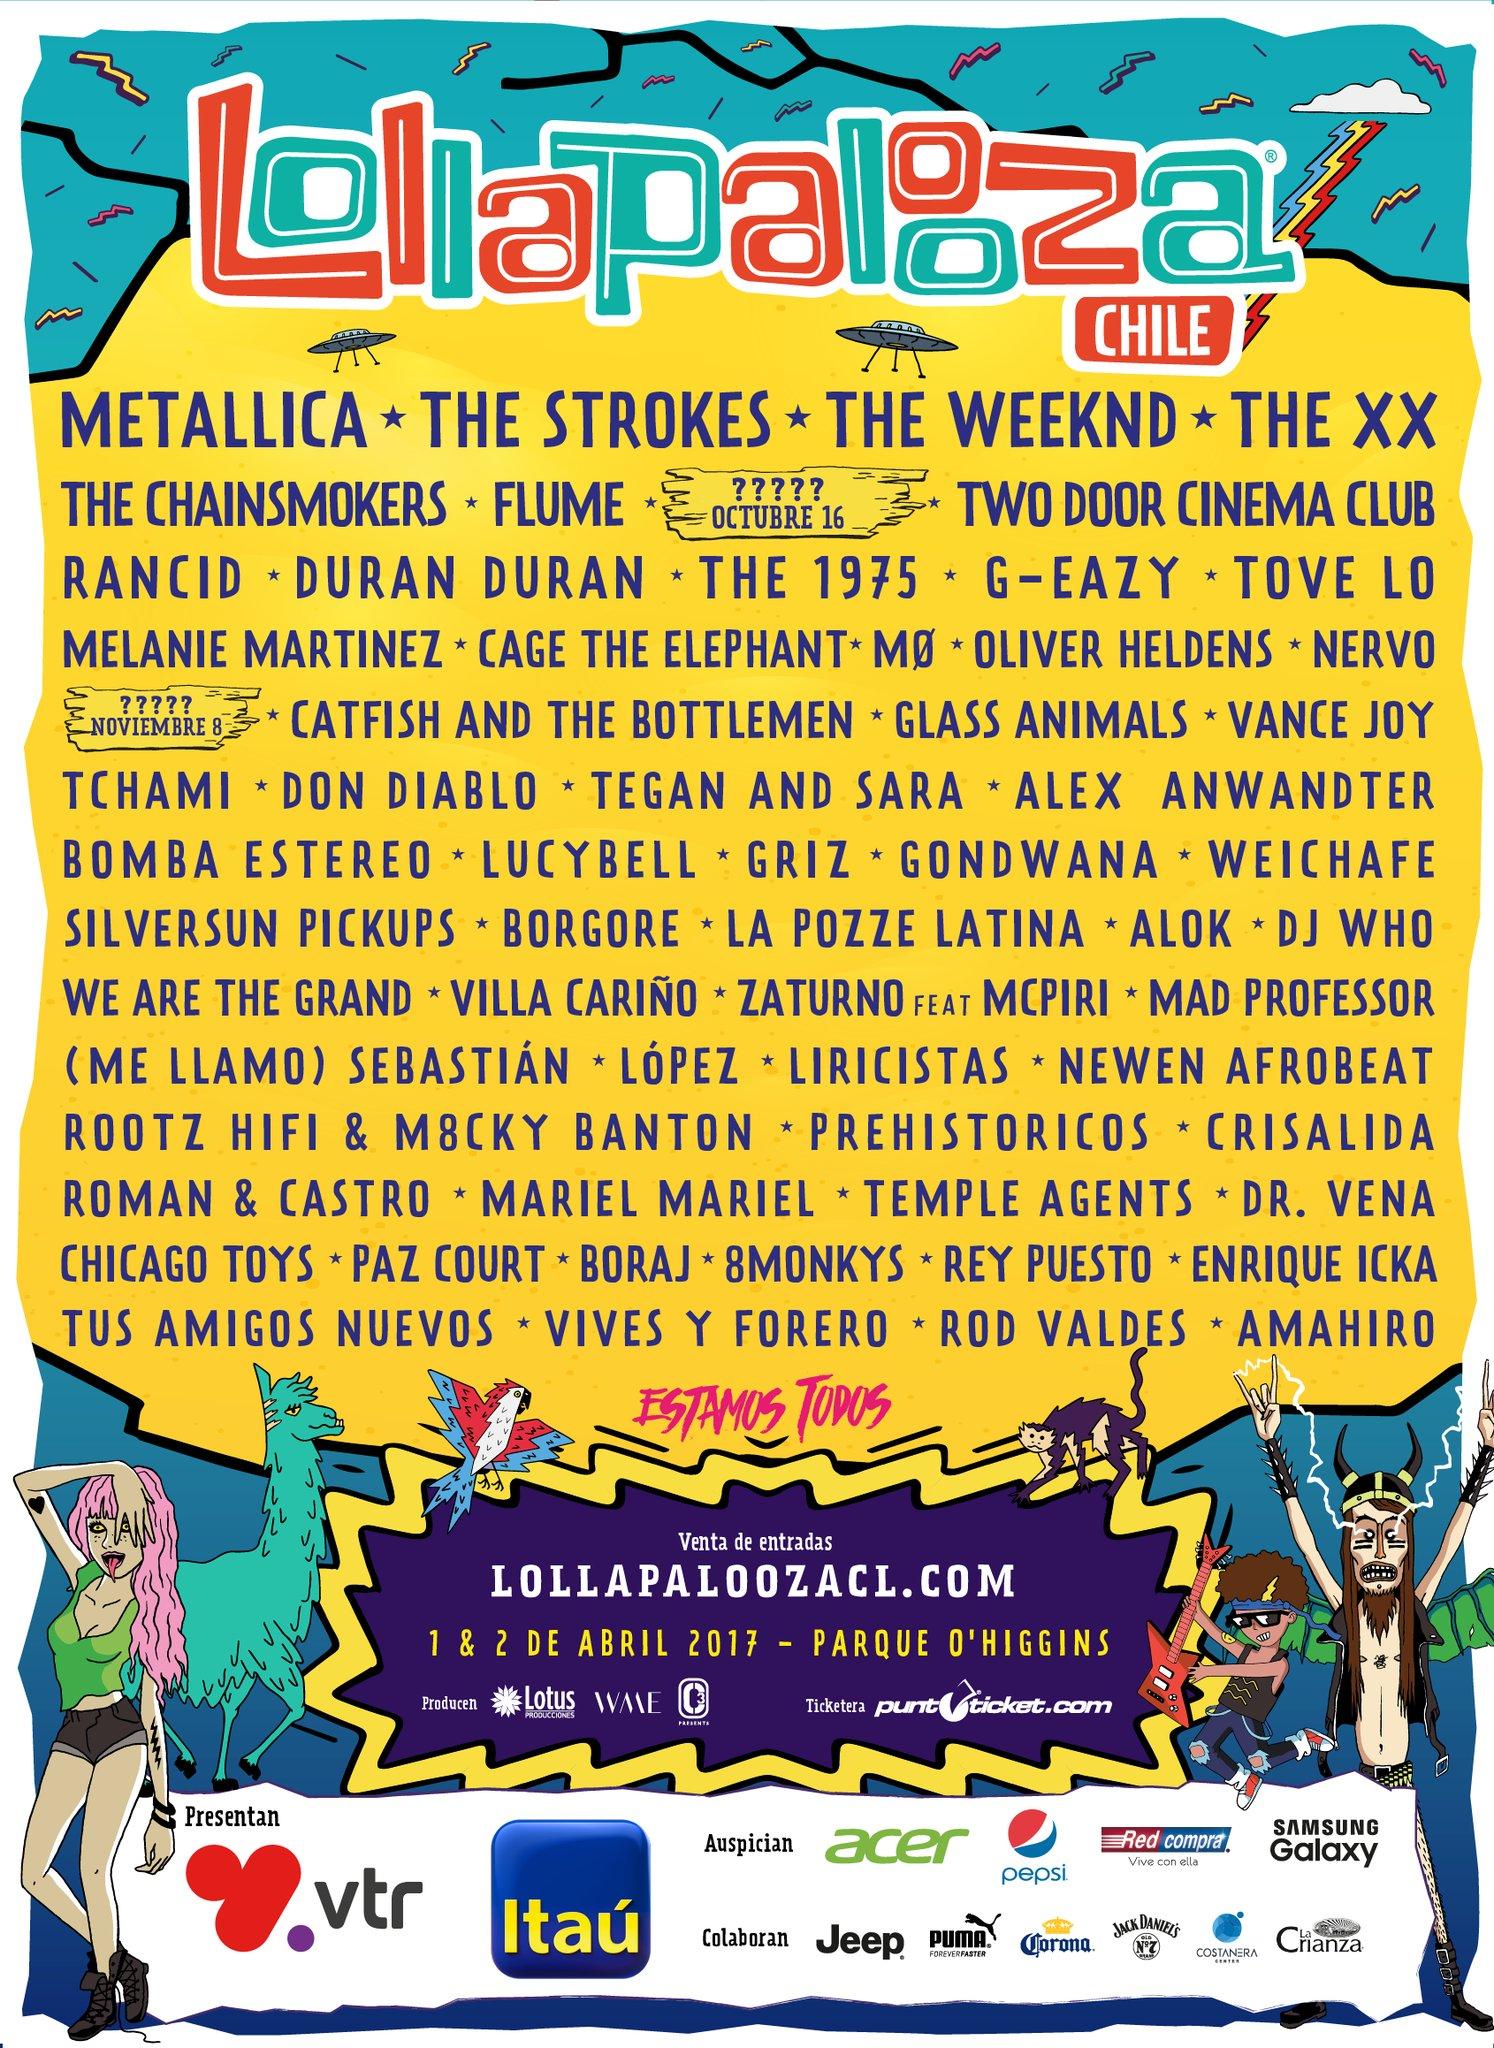 Line-up do Lollapalooza Chile 2017